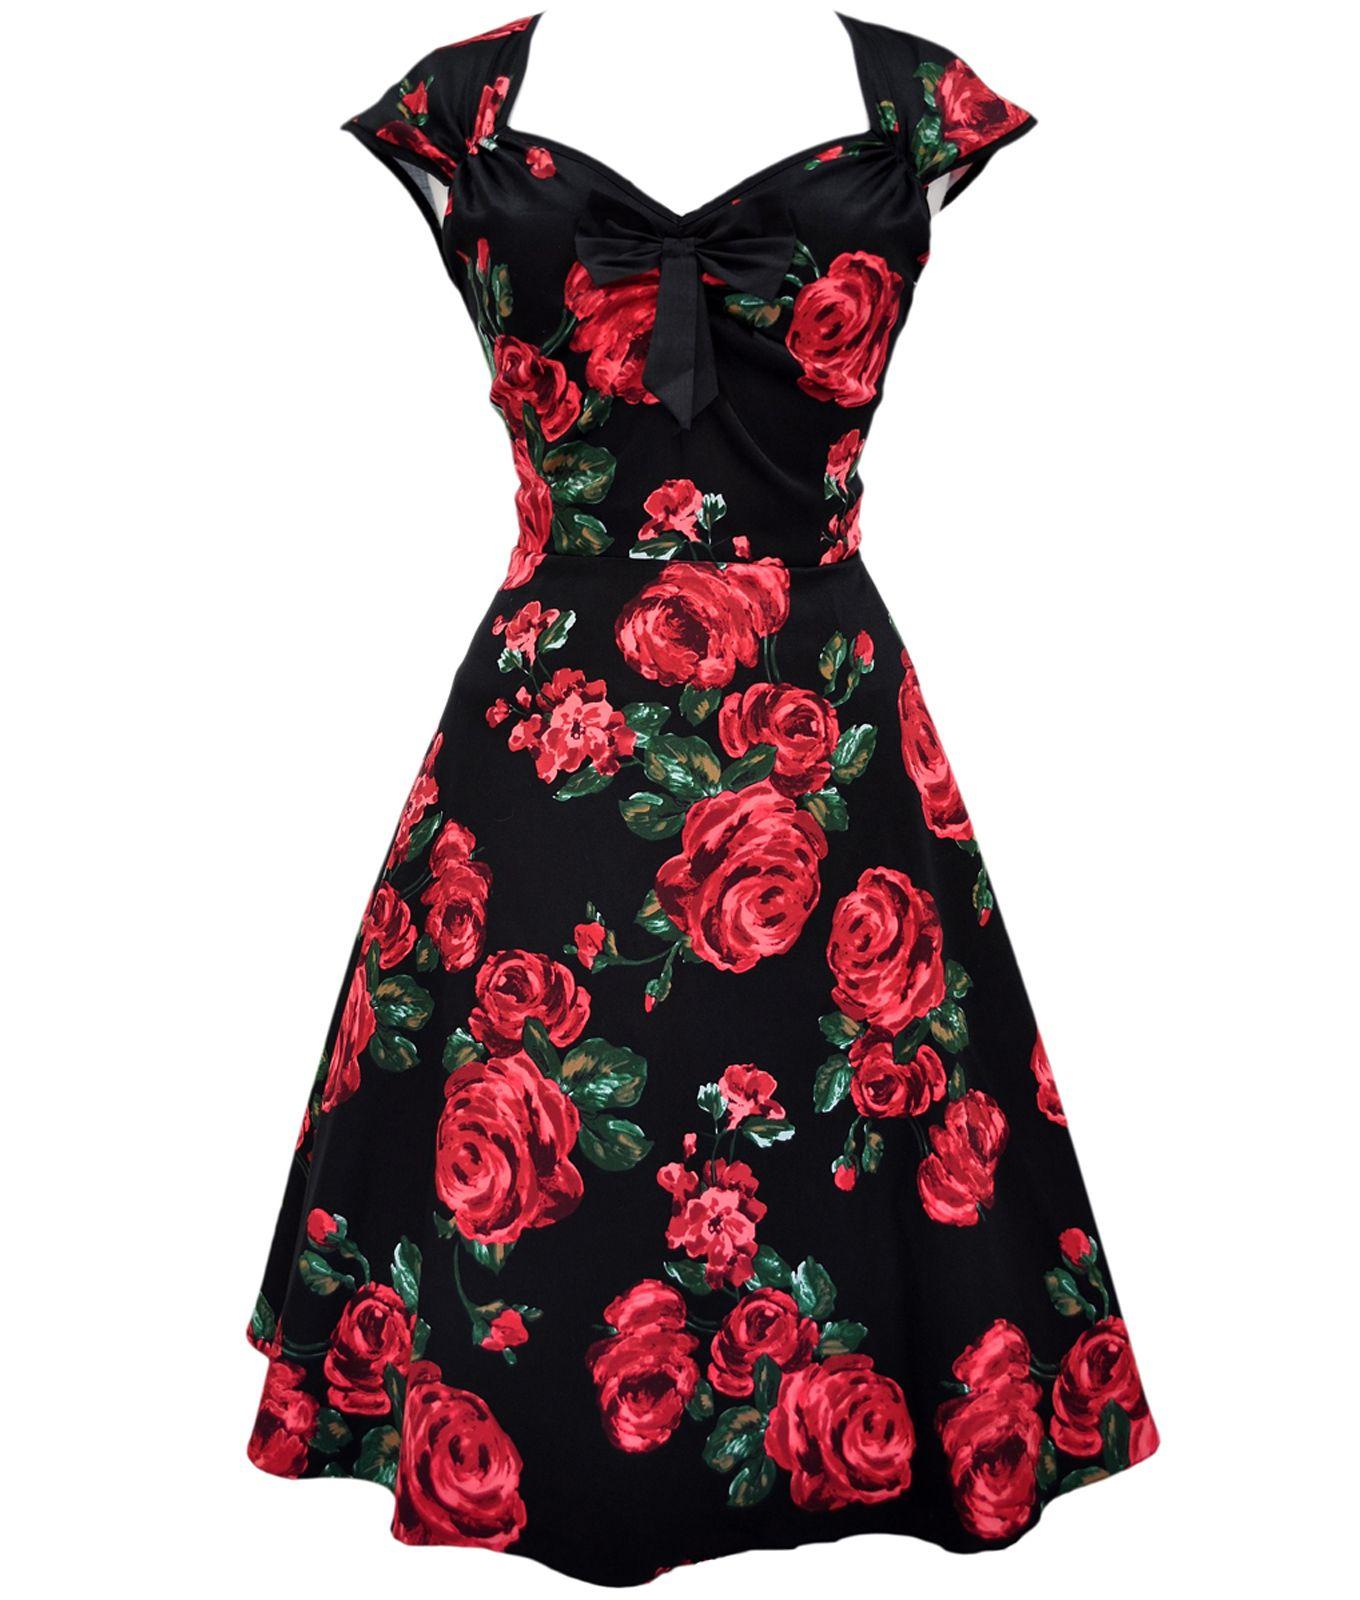 Lady vintage us isabella red rose floral dress black womenus